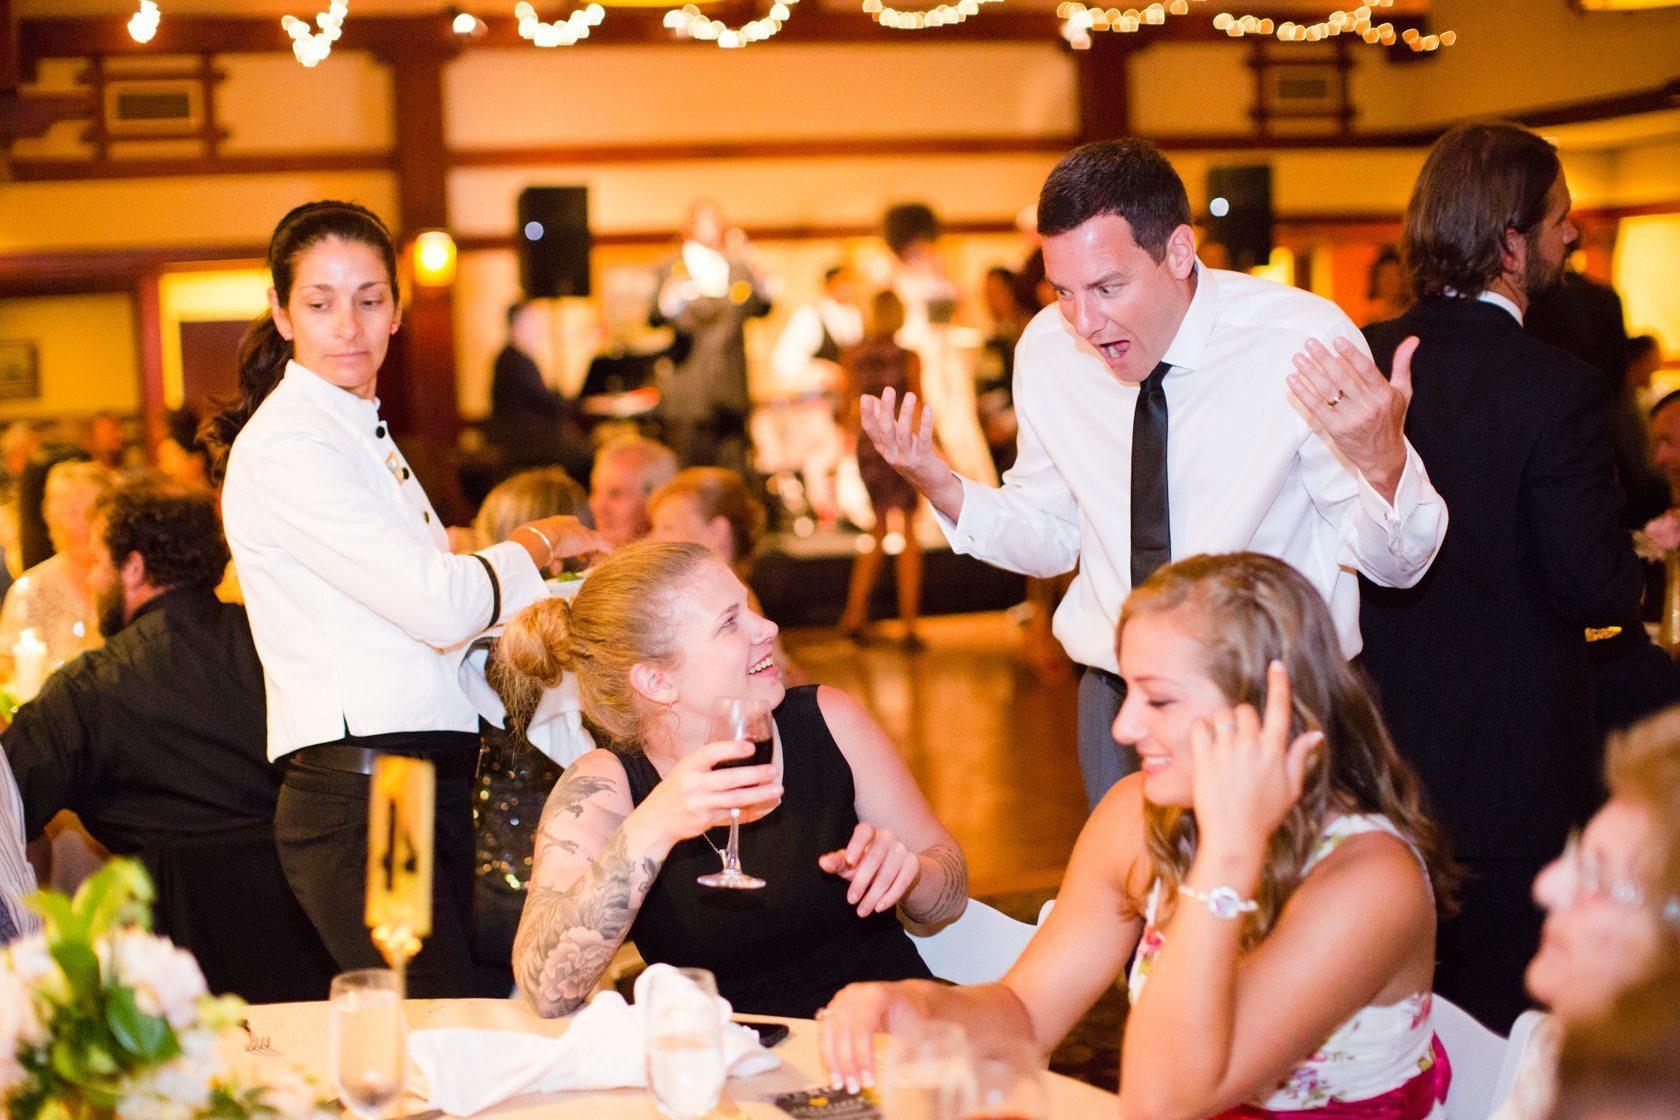 The_Lodge_at_Torrey_Pines_Wedding_114.jpg